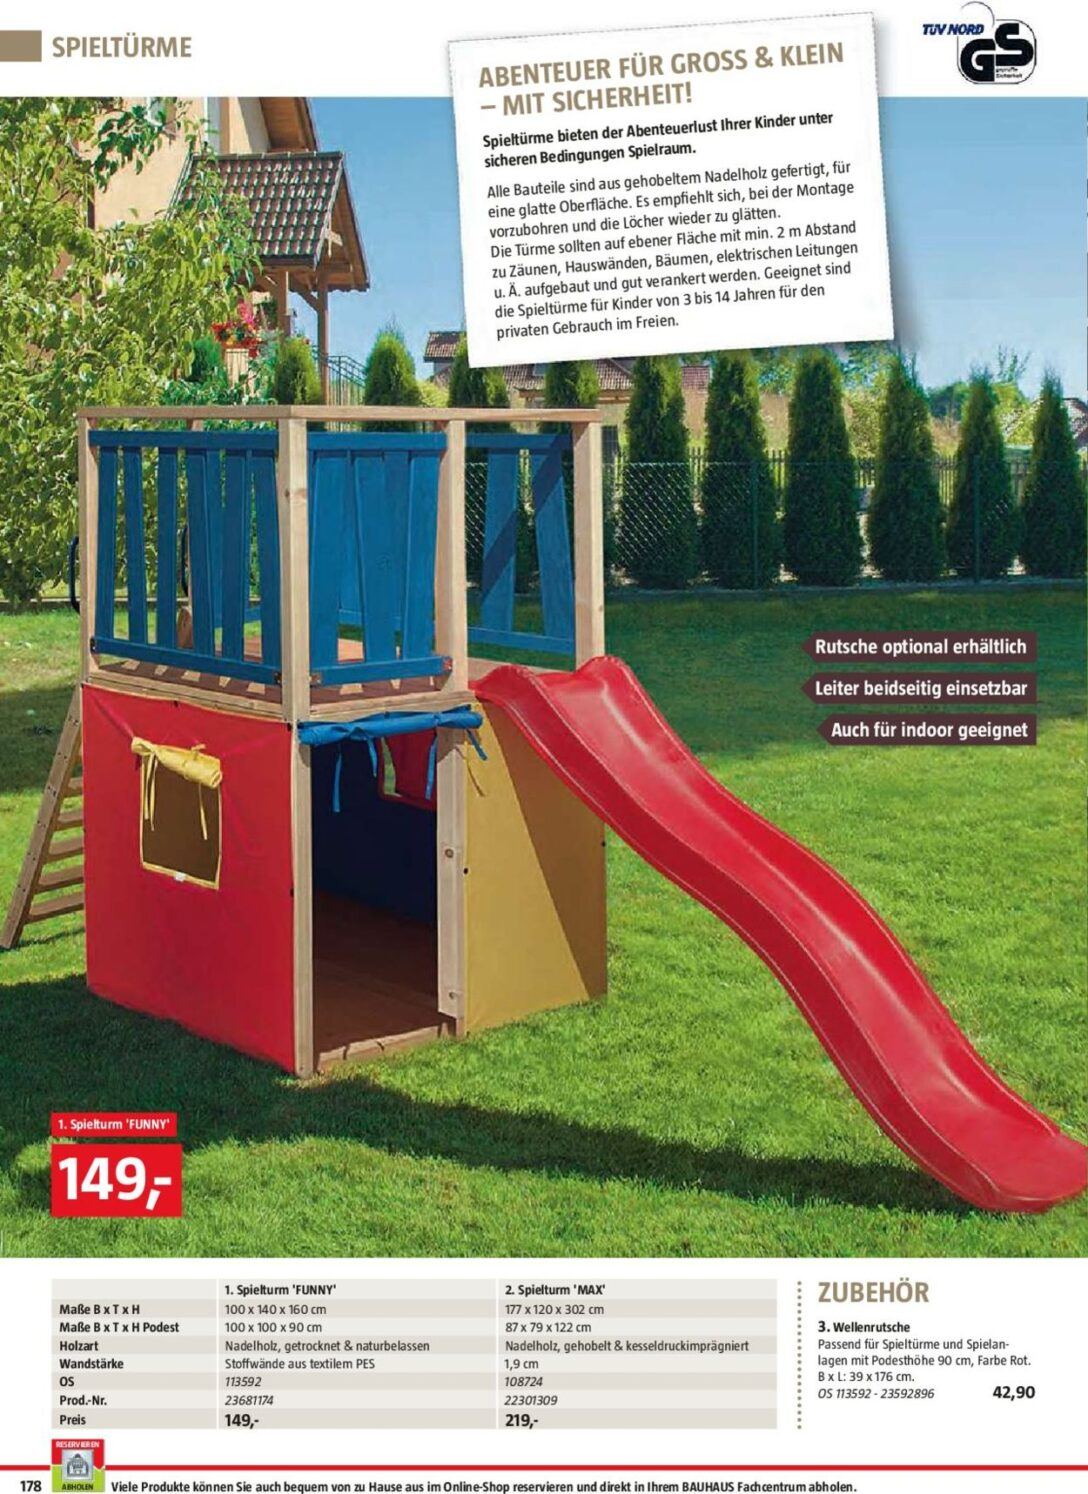 Large Size of Spielturm Bauhaus Aktueller Prospekt 2503 30062019 178 Jedewoche Garten Kinderspielturm Fenster Wohnzimmer Spielturm Bauhaus